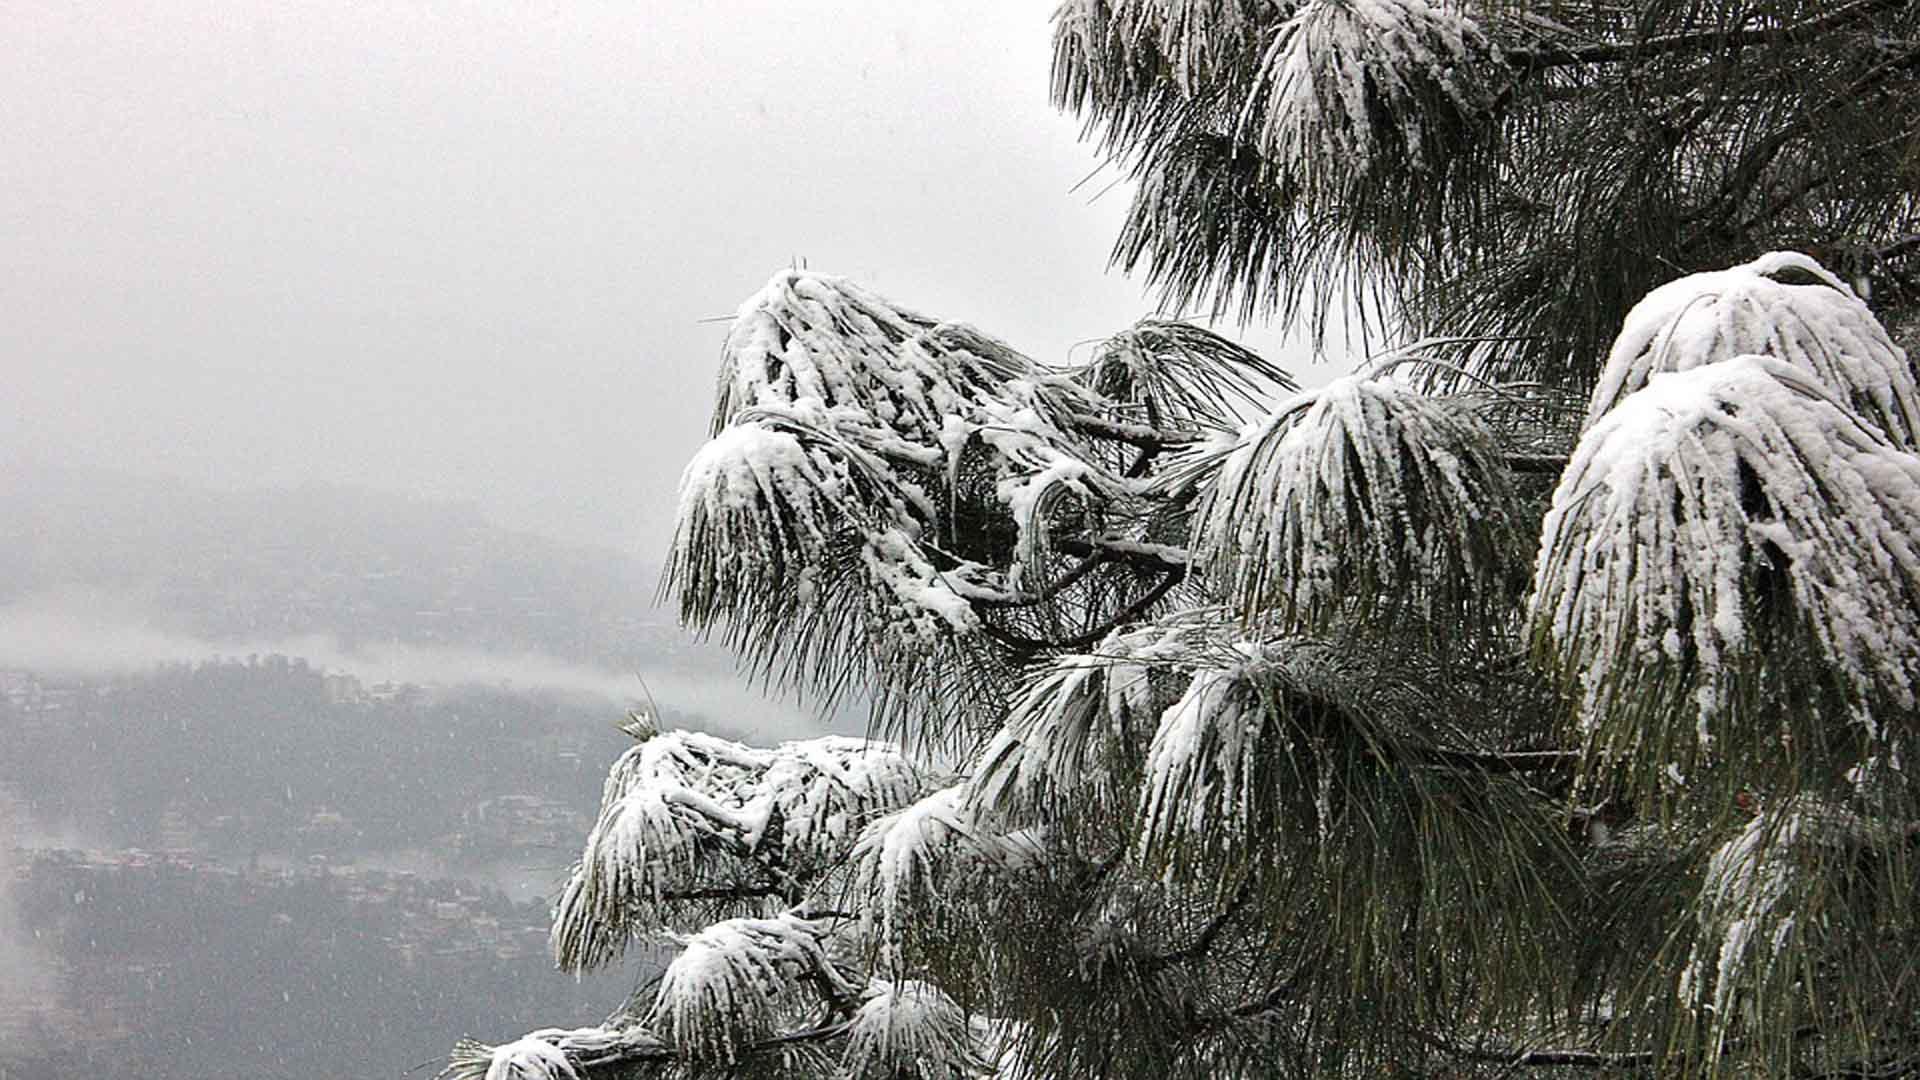 Snow Fall In shimla